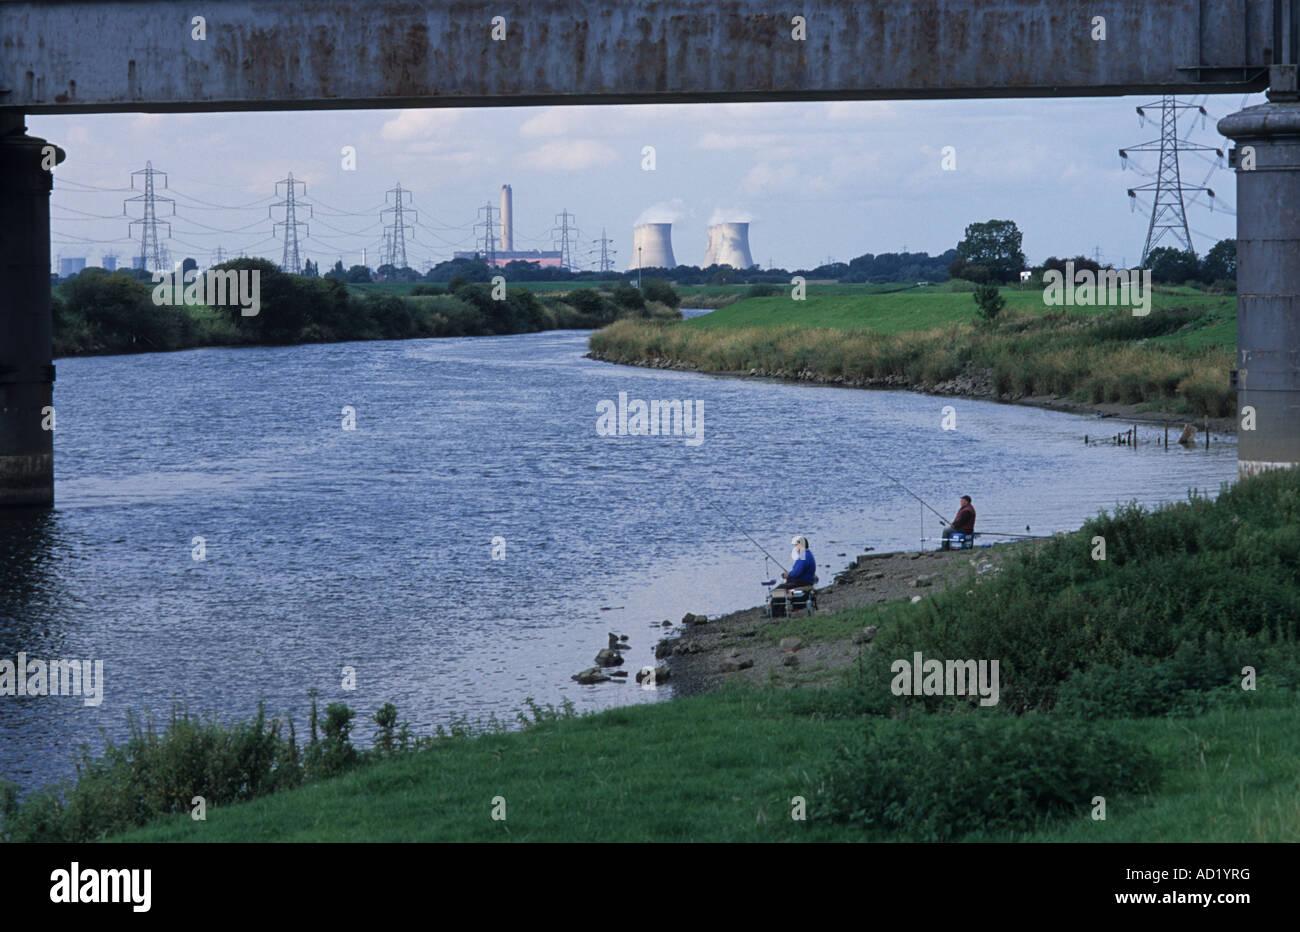 River Trent, North Clifton, Lincolnshire, United Kingdom. - Stock Image